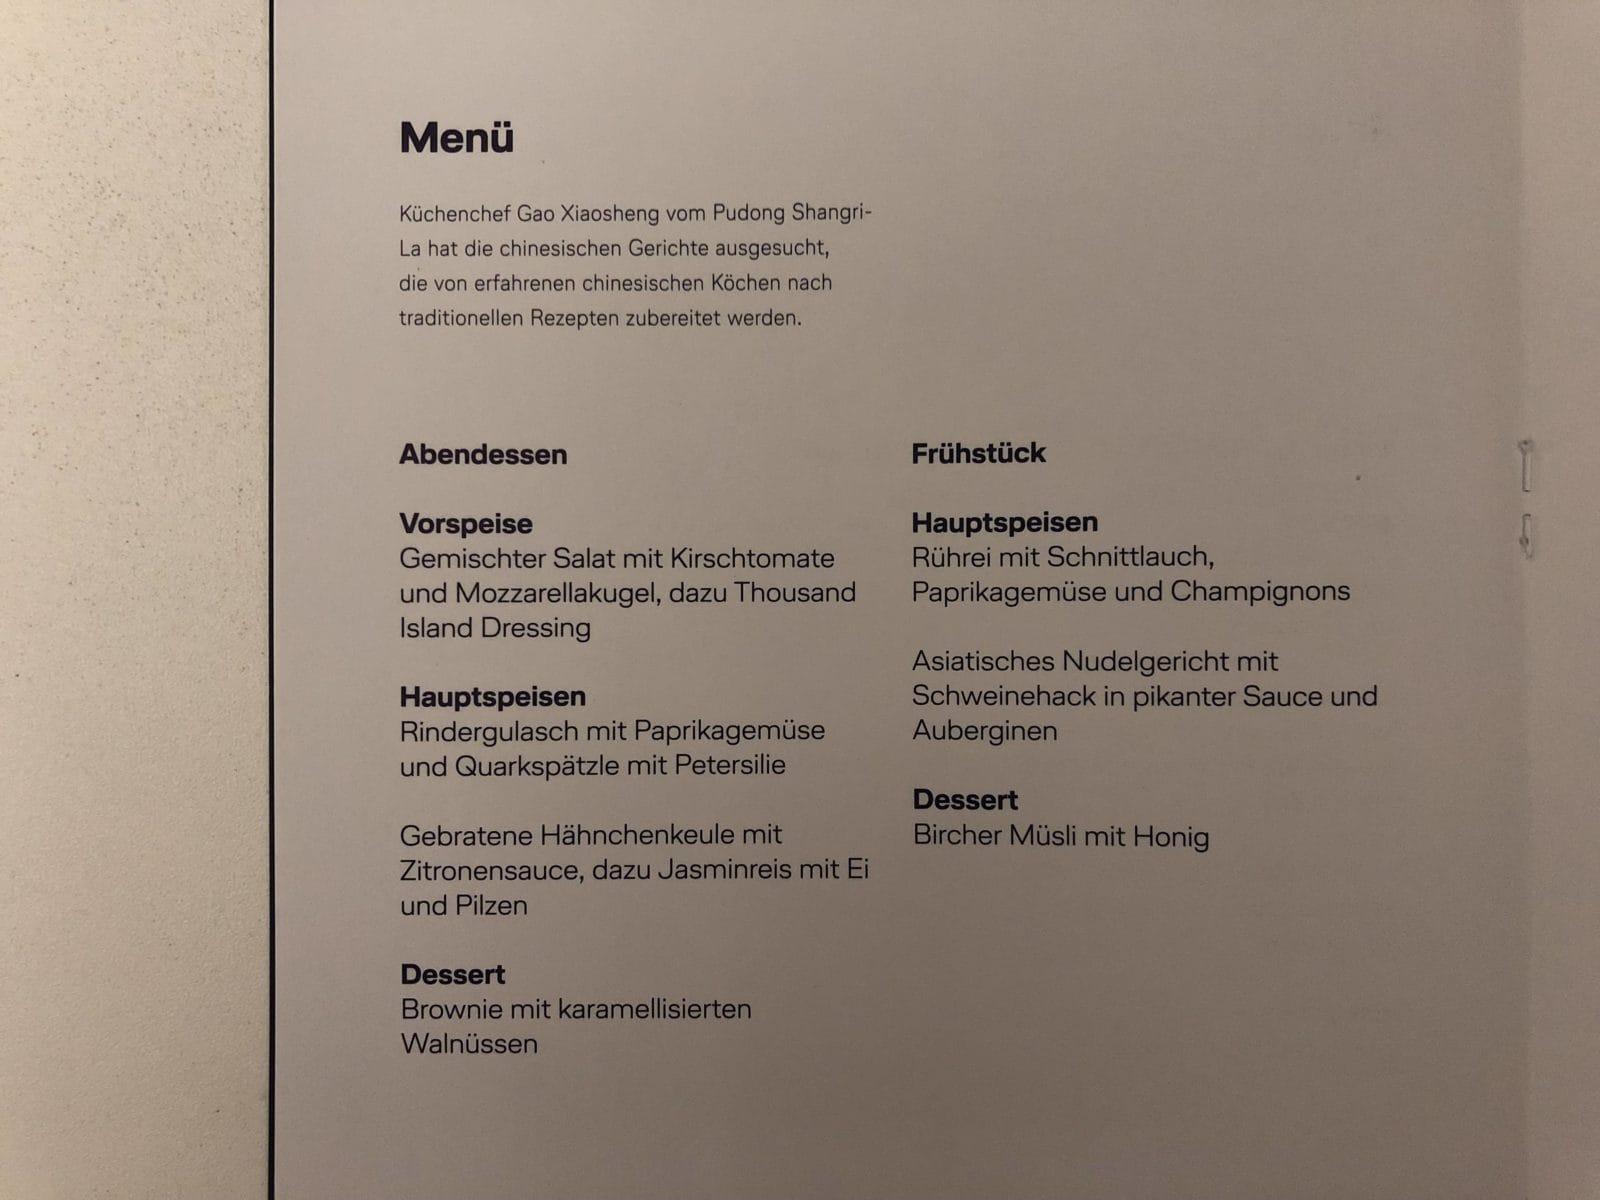 Lufthansa Premium Economy Menü Karte